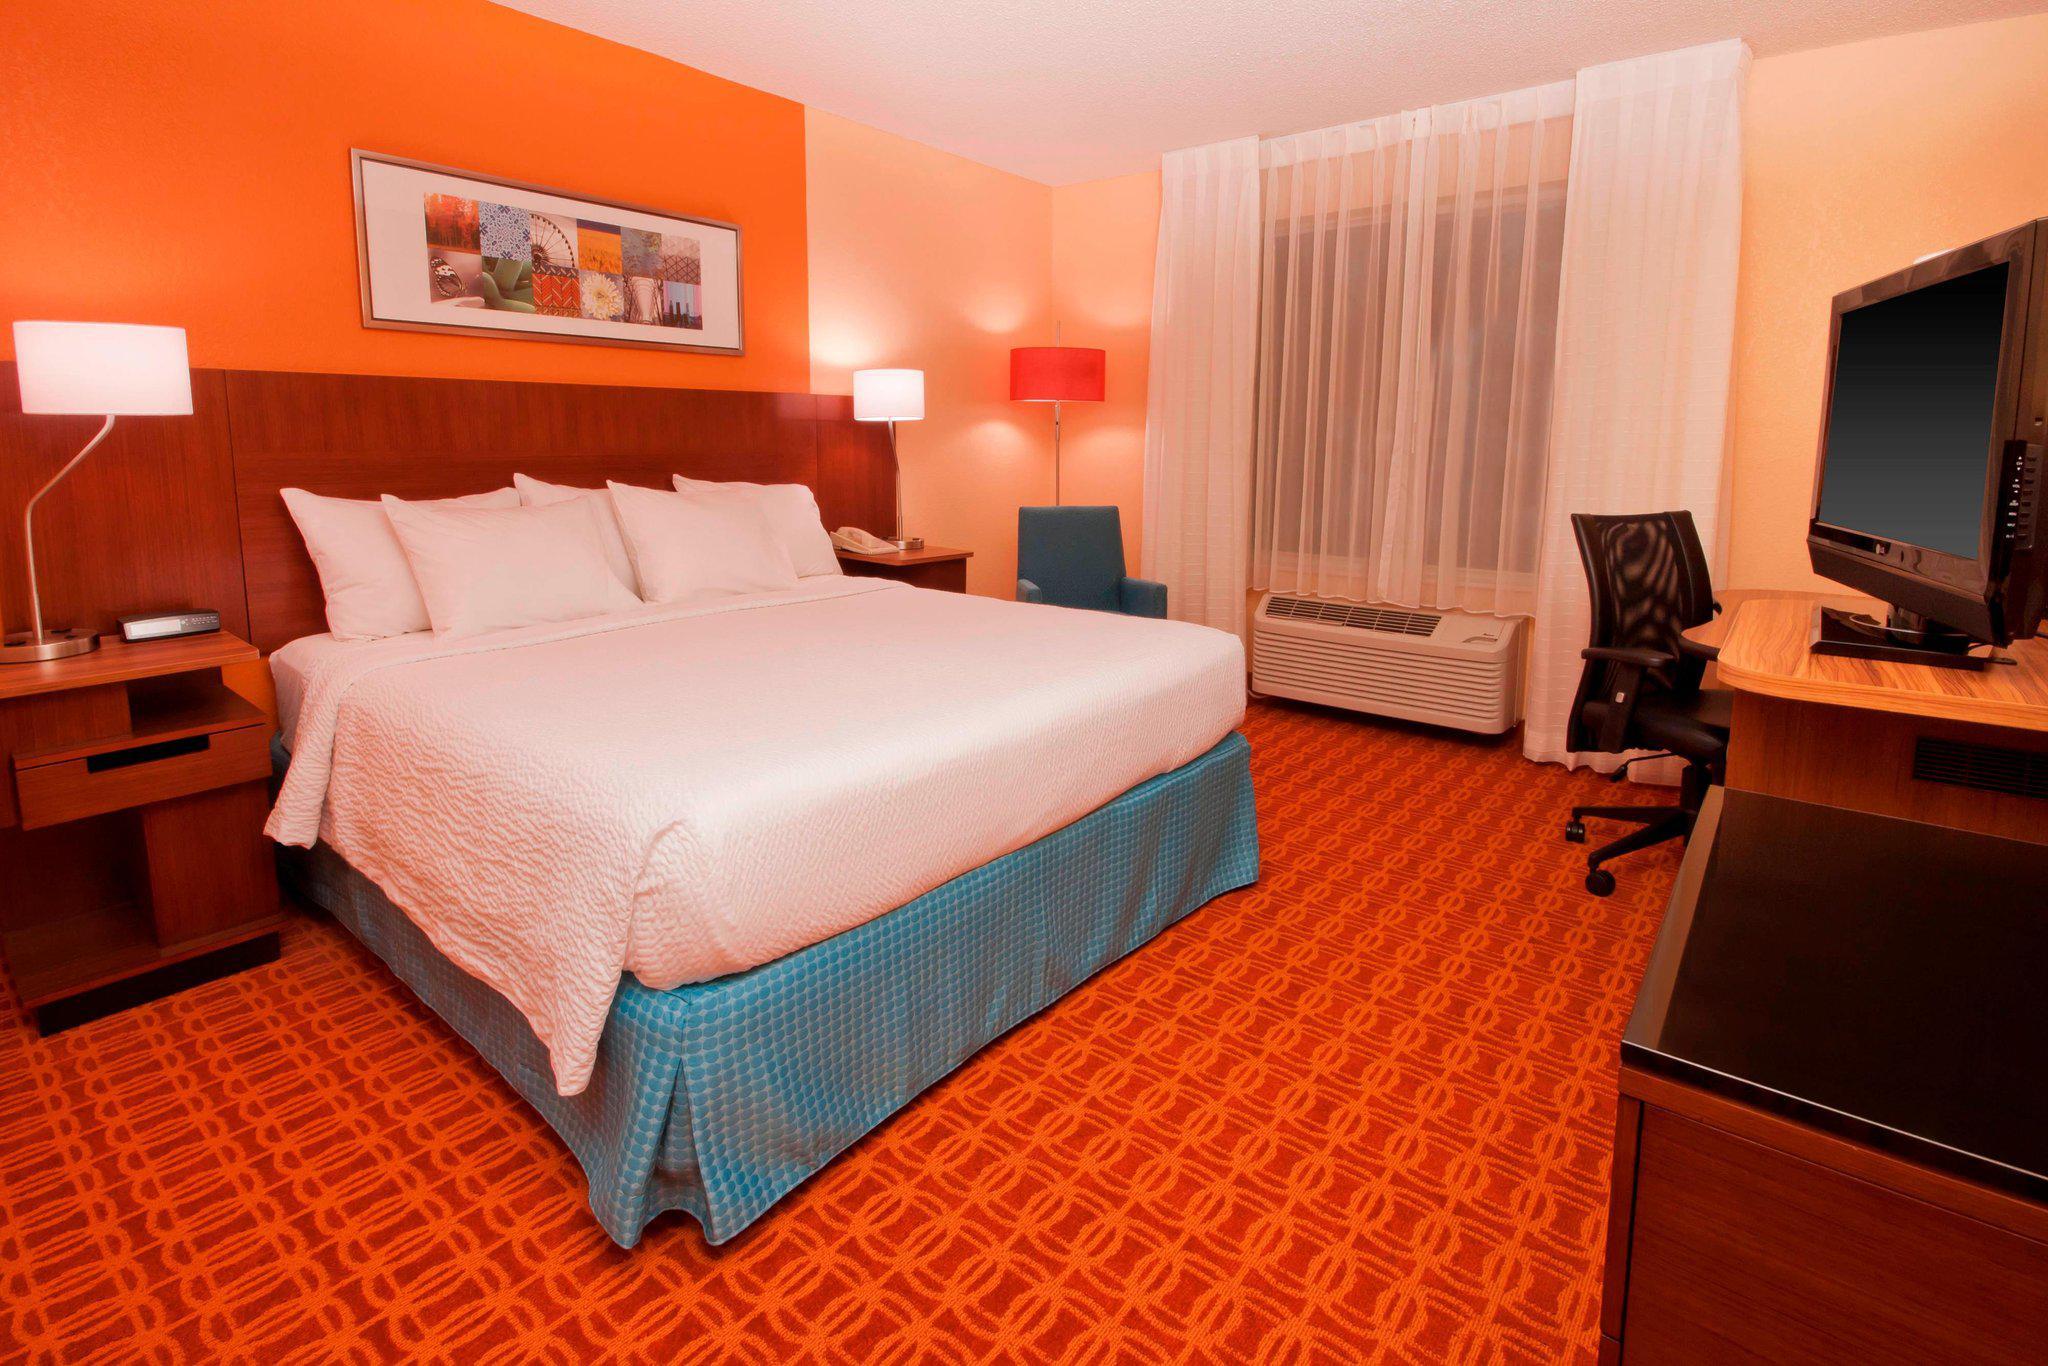 Fairfield Inn & Suites by Marriott Fort Worth/Fossil Creek